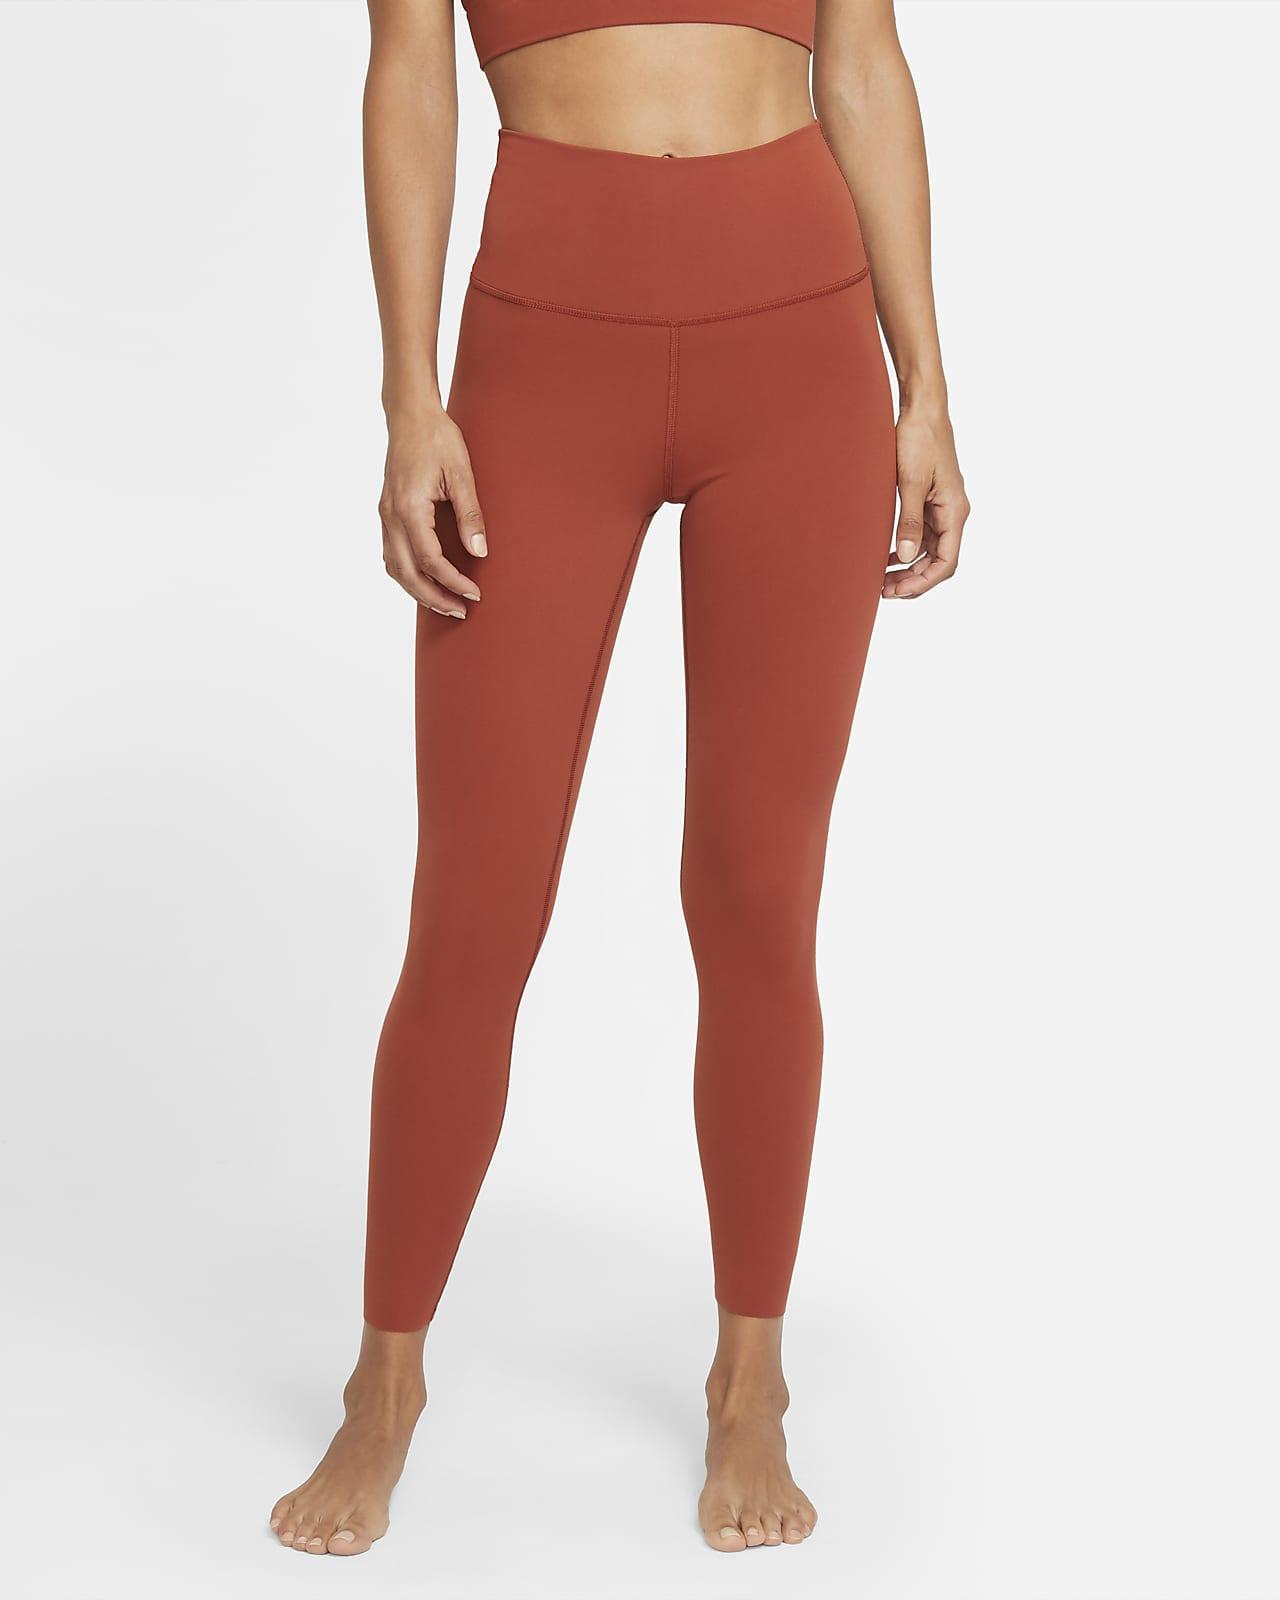 Leggings de tela Infinalon y cintura alta de 7/8 para mujer Nike Yoga Luxe